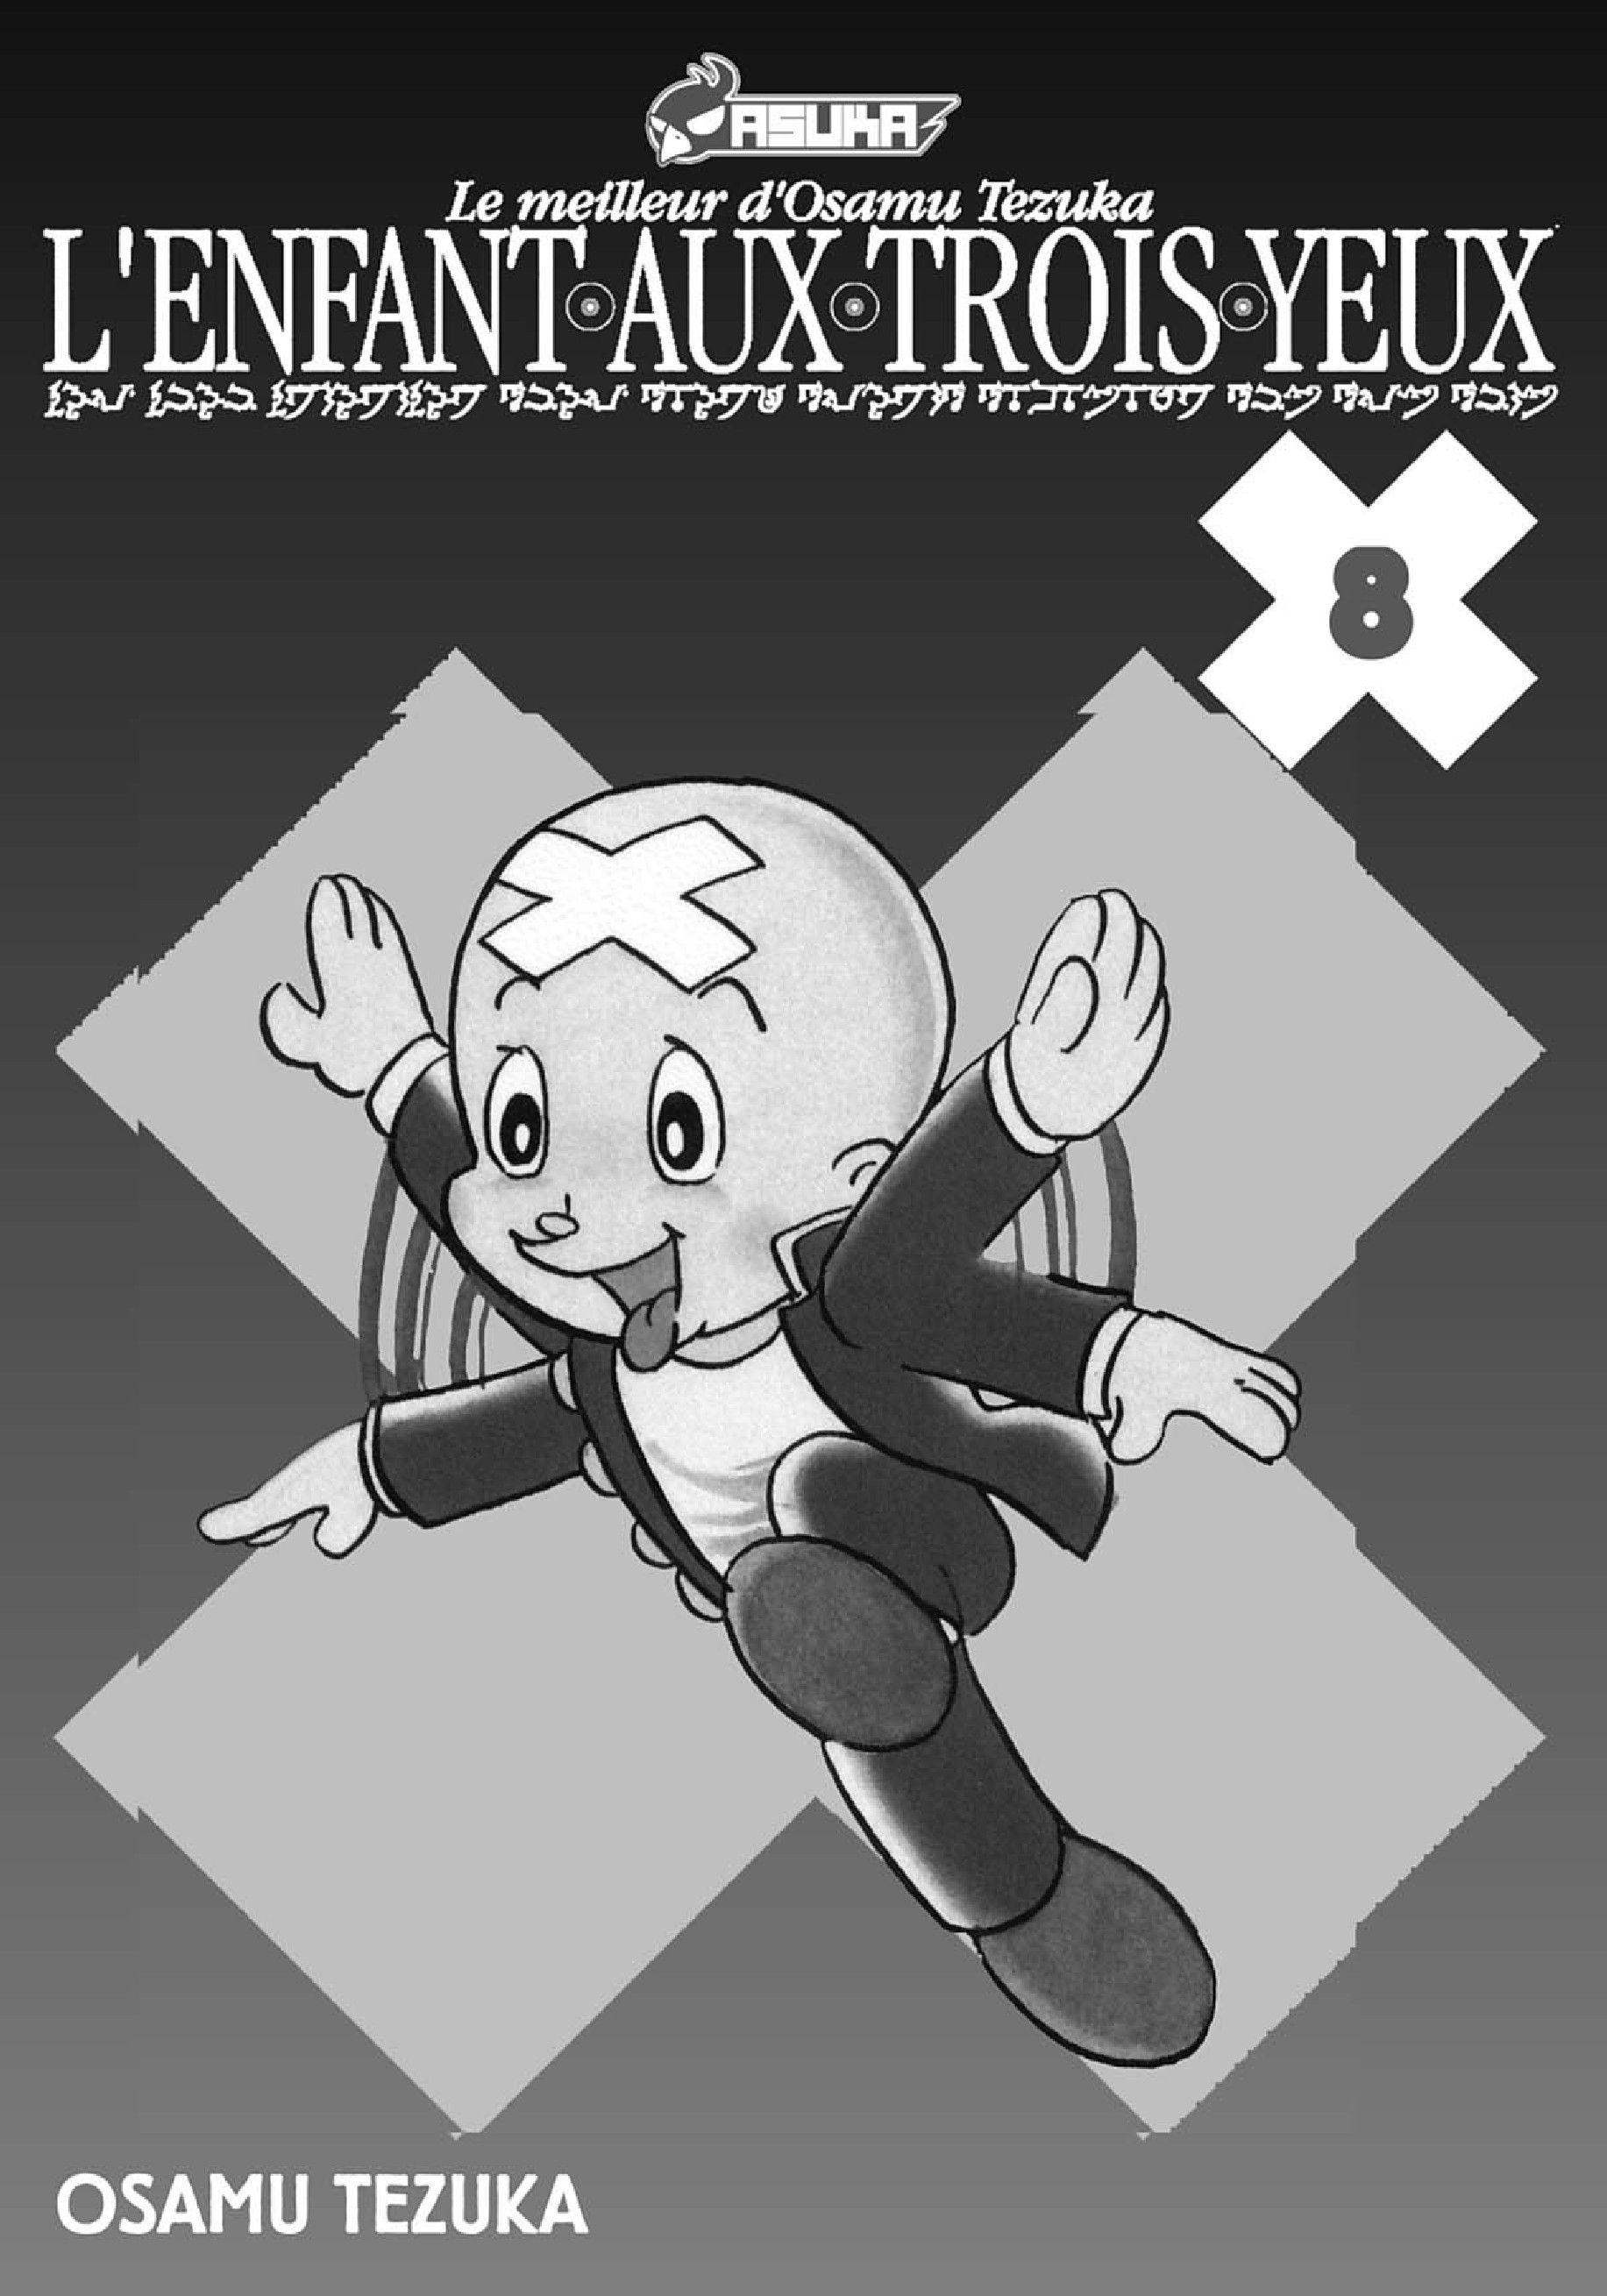 https://nine.mangadogs.com/fr_manga/pic1/13/1357/53888/L039EnfantAuxTroisYeuxVolu_1_727.jpg Page 2